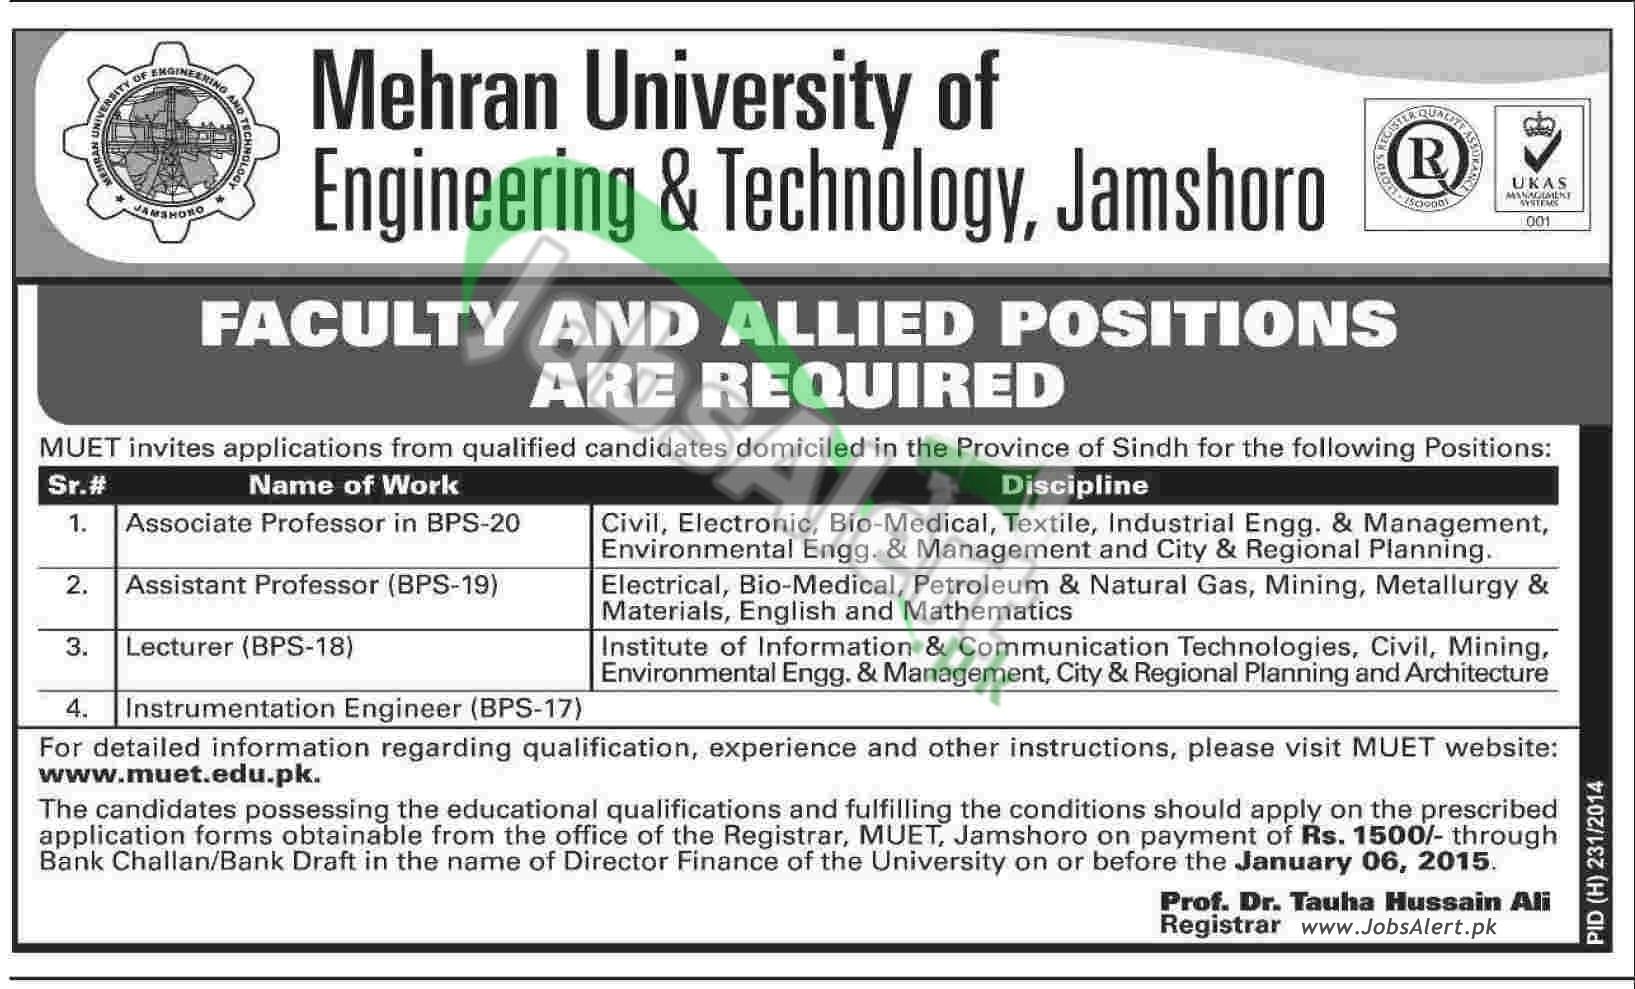 Mehran University (MUET) Jamshoro